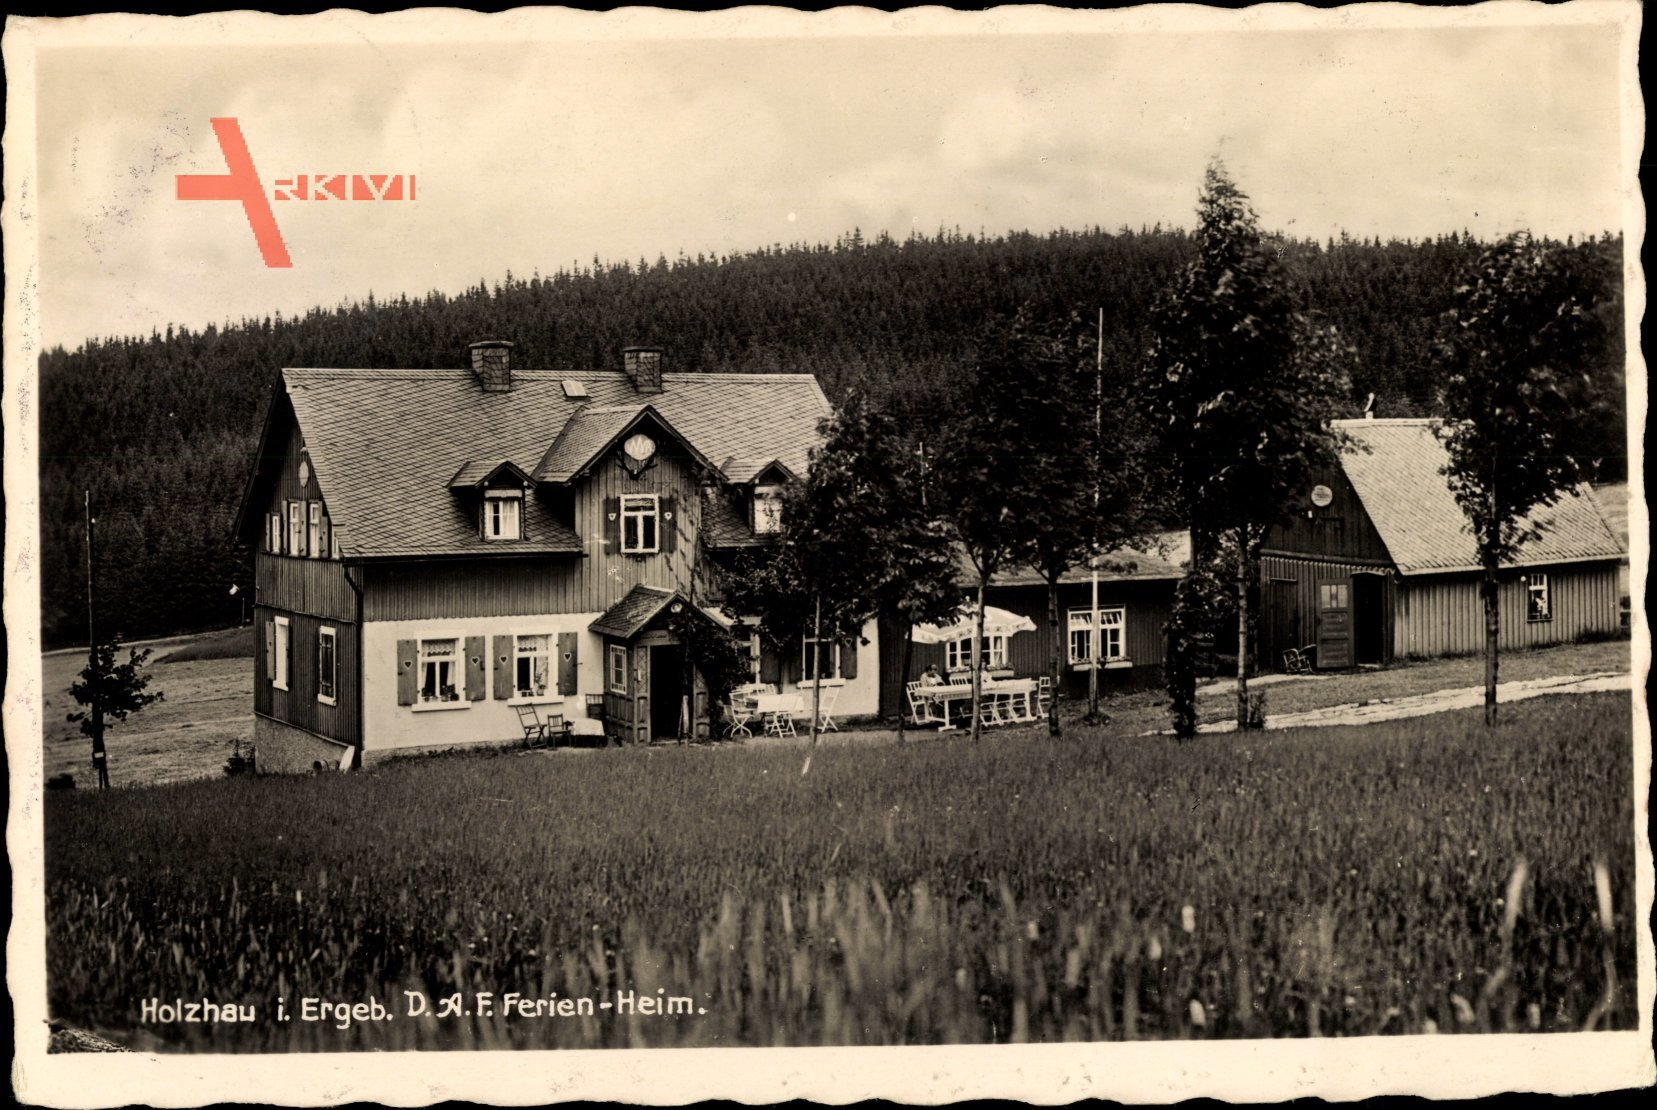 Holzhau Rechenberg Bienenmühle Erzgebirge, Blick zum D.A.F. Ferienheim, Wald